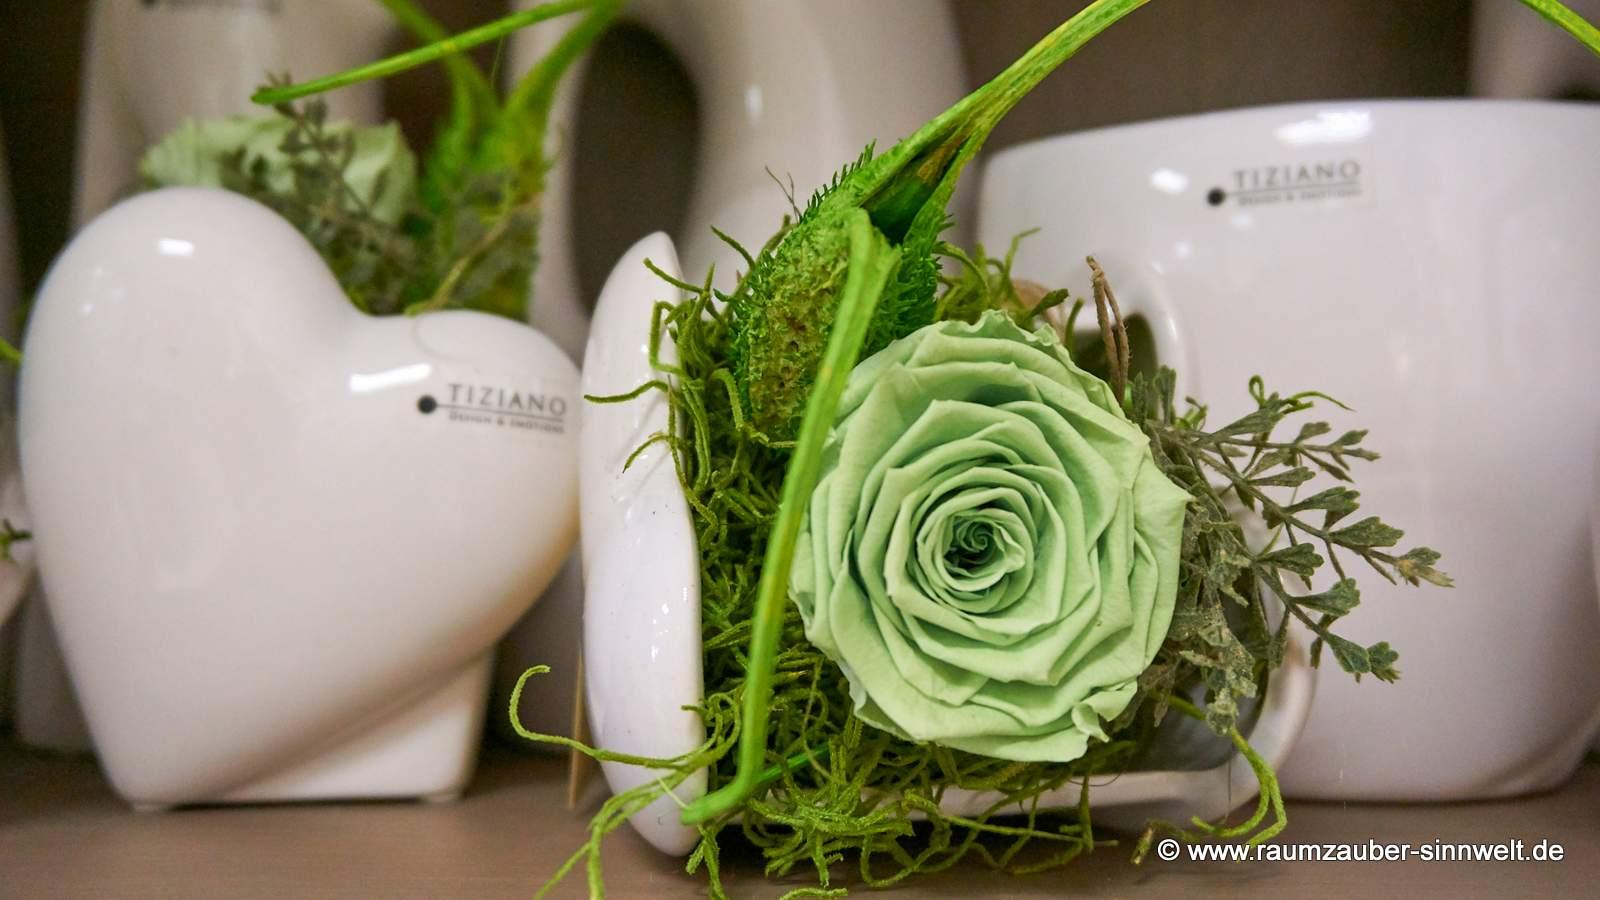 Trockendekoration mit gefriergetrockneter Rose in TIZIANO-Keramik